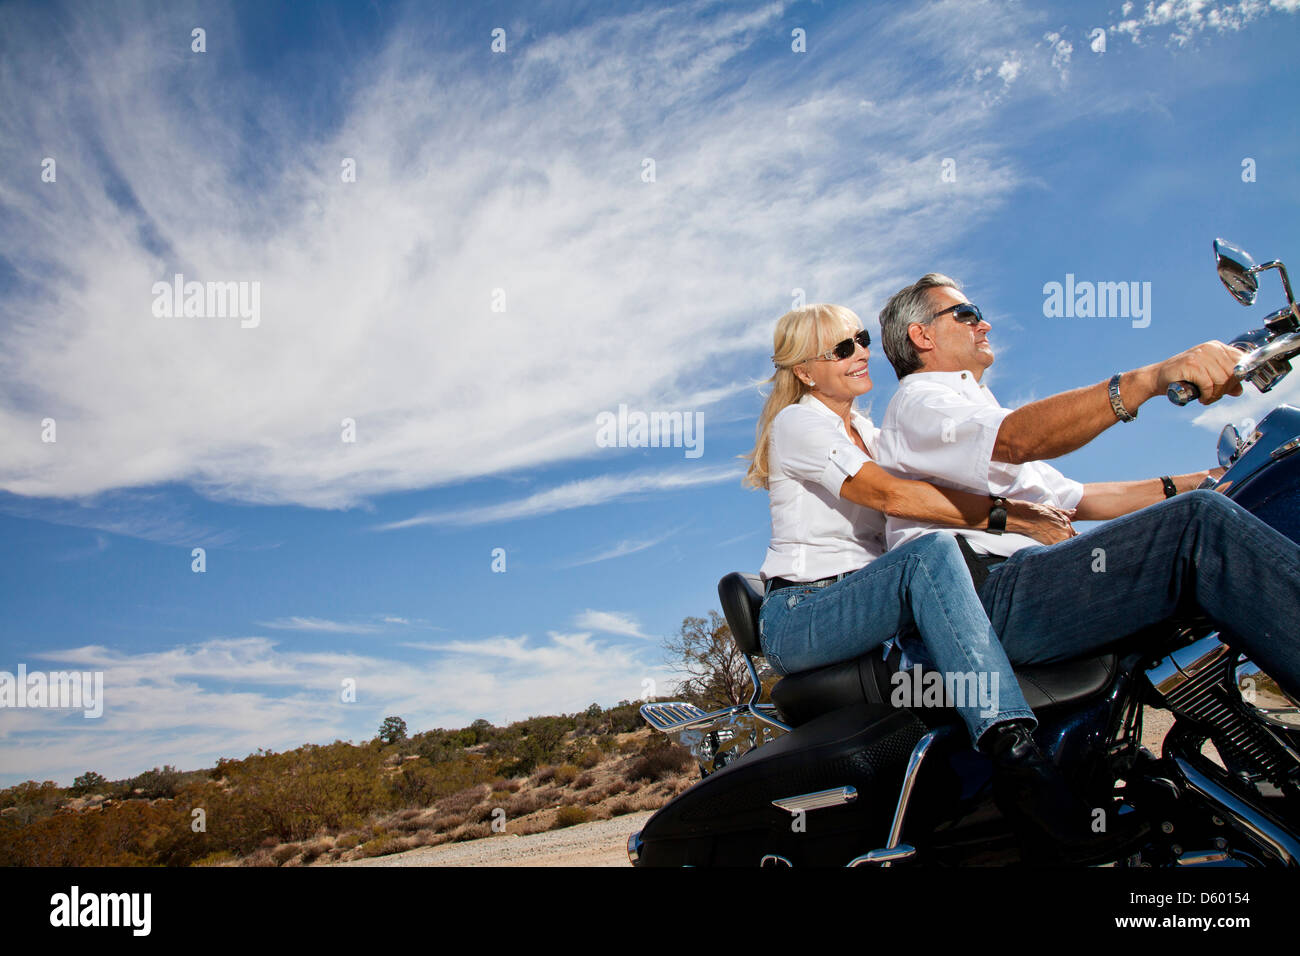 Senior couple riding motorcycle desert road - Stock Image